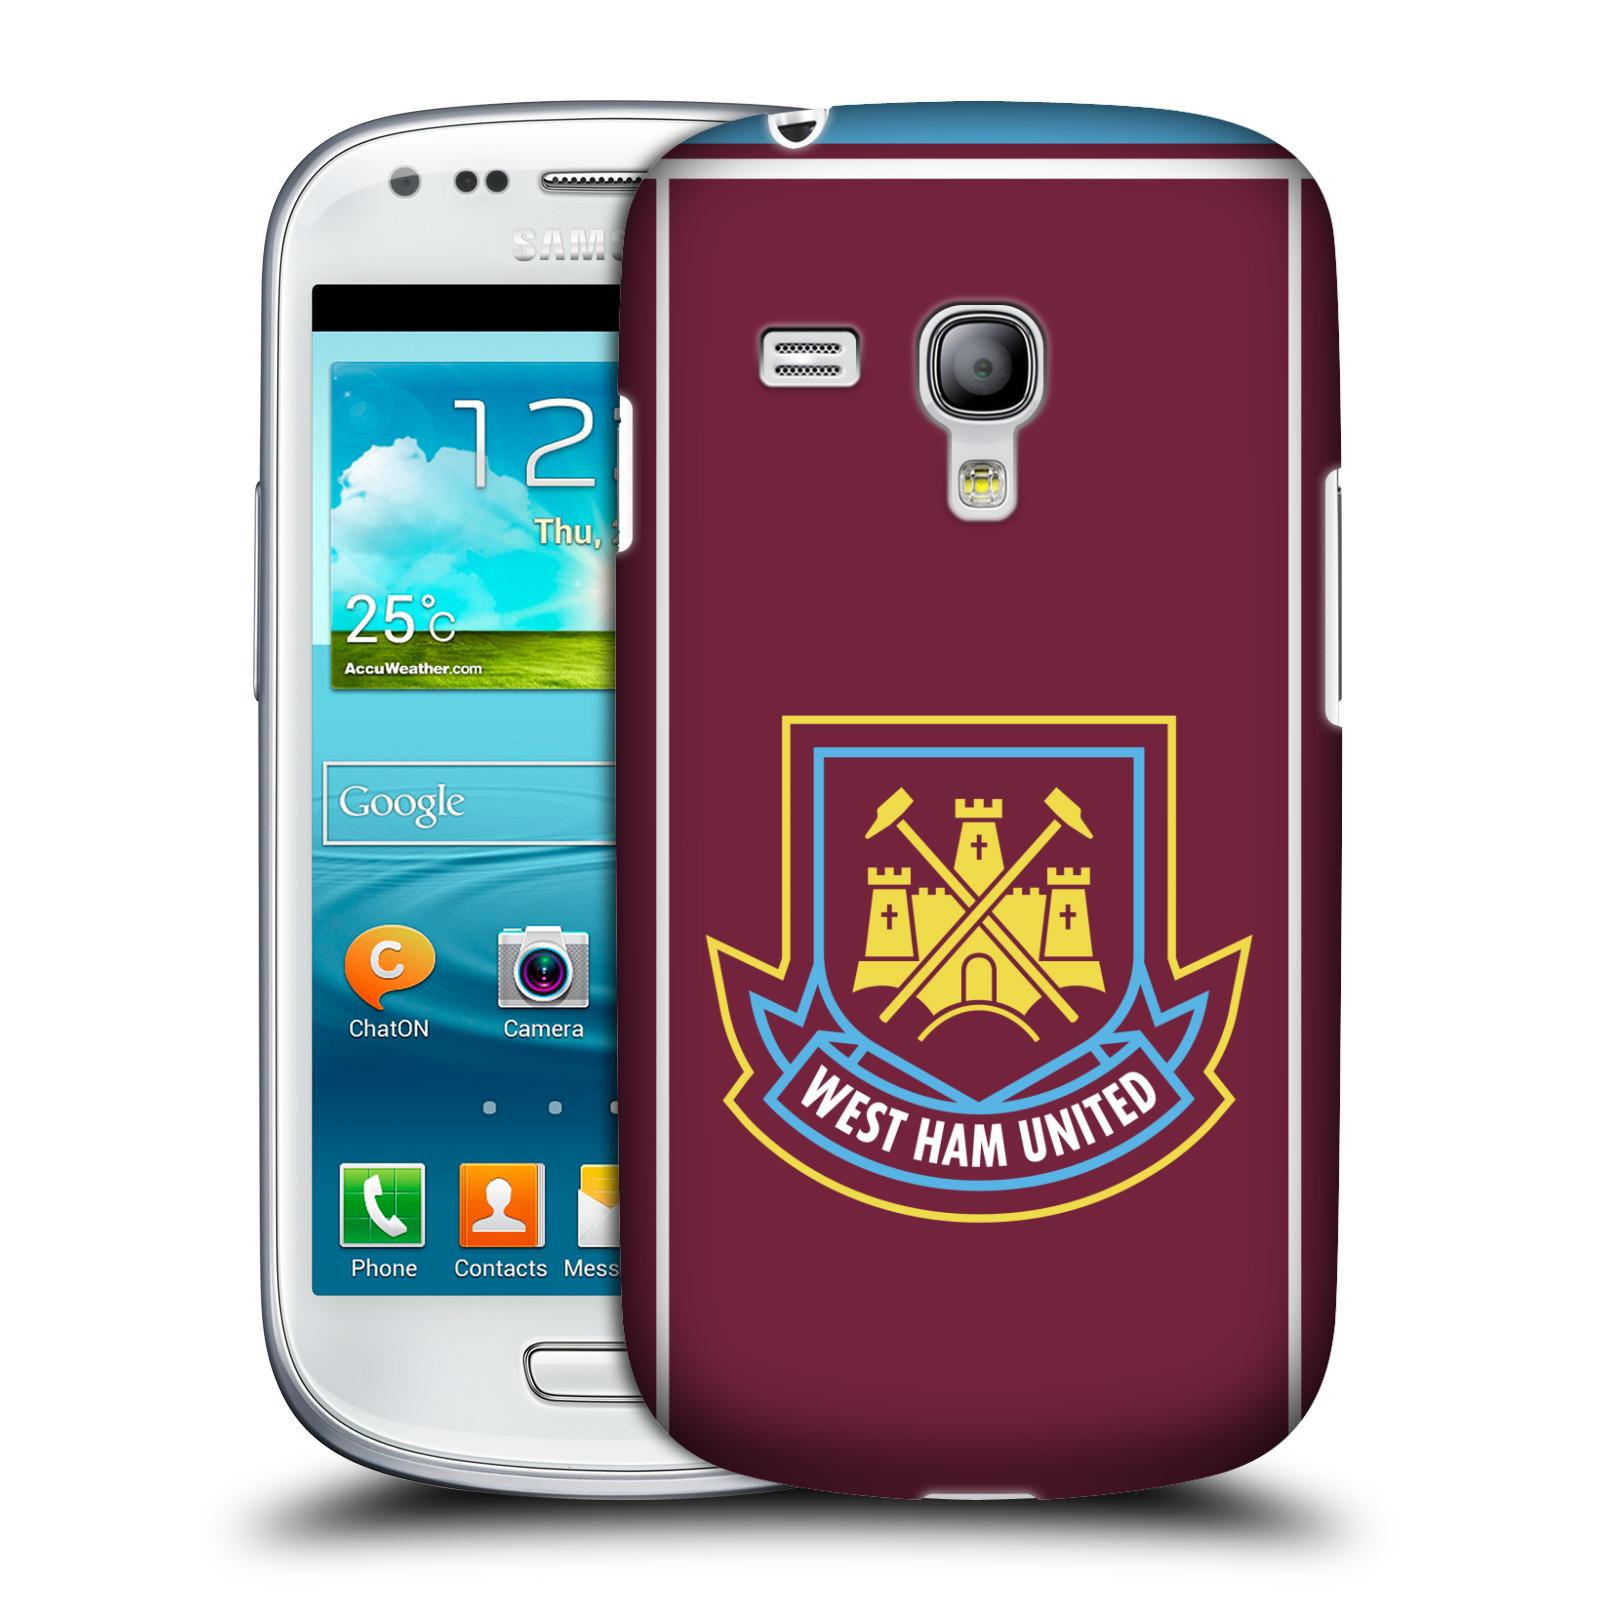 Plastové pouzdro na mobil Samsung Galaxy S III Mini - Head Case - West Ham United - Retro znak (Plastový kryt či obal na mobilní telefon s motivem West Ham United - Kladiváři - Retro znak pro Samsung Galaxy S III Mini GT-i8190)